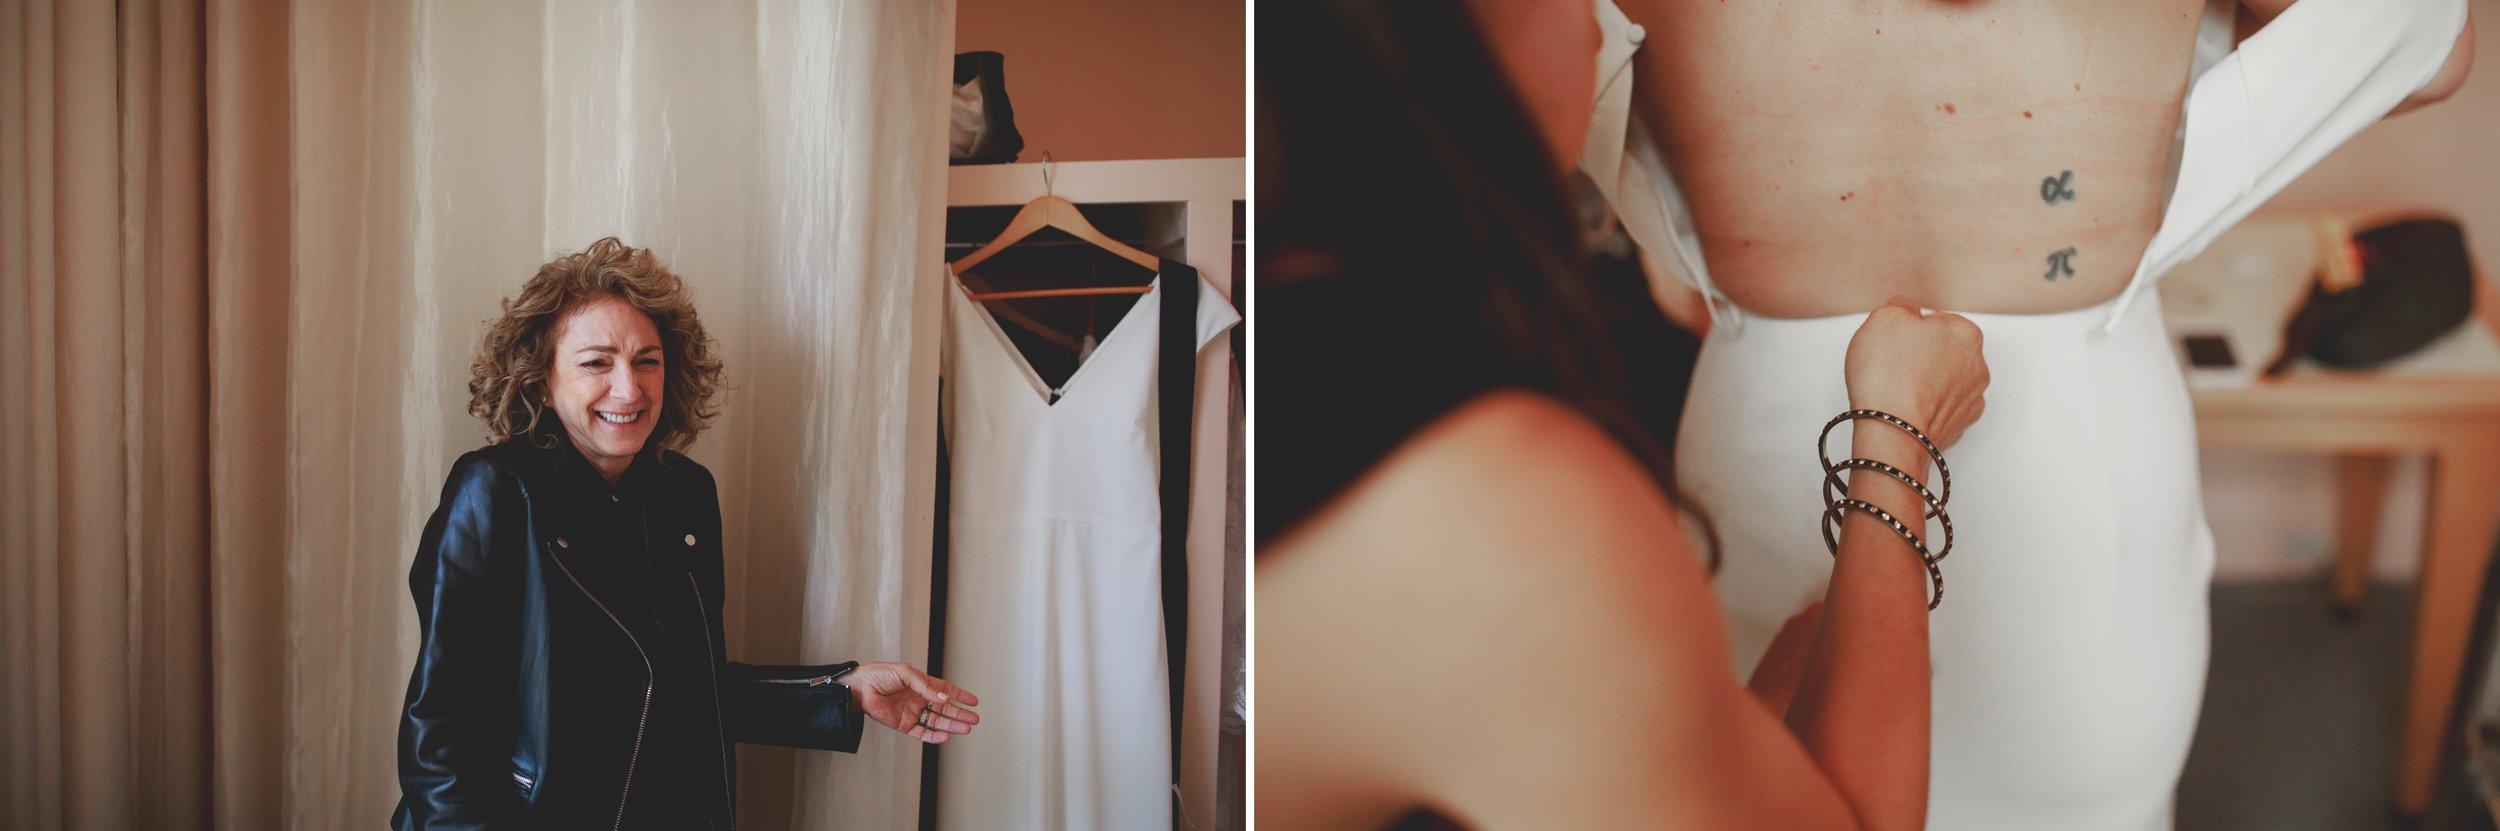 amandavanvels_headlands_center_wedding_san_francisco_018.jpg